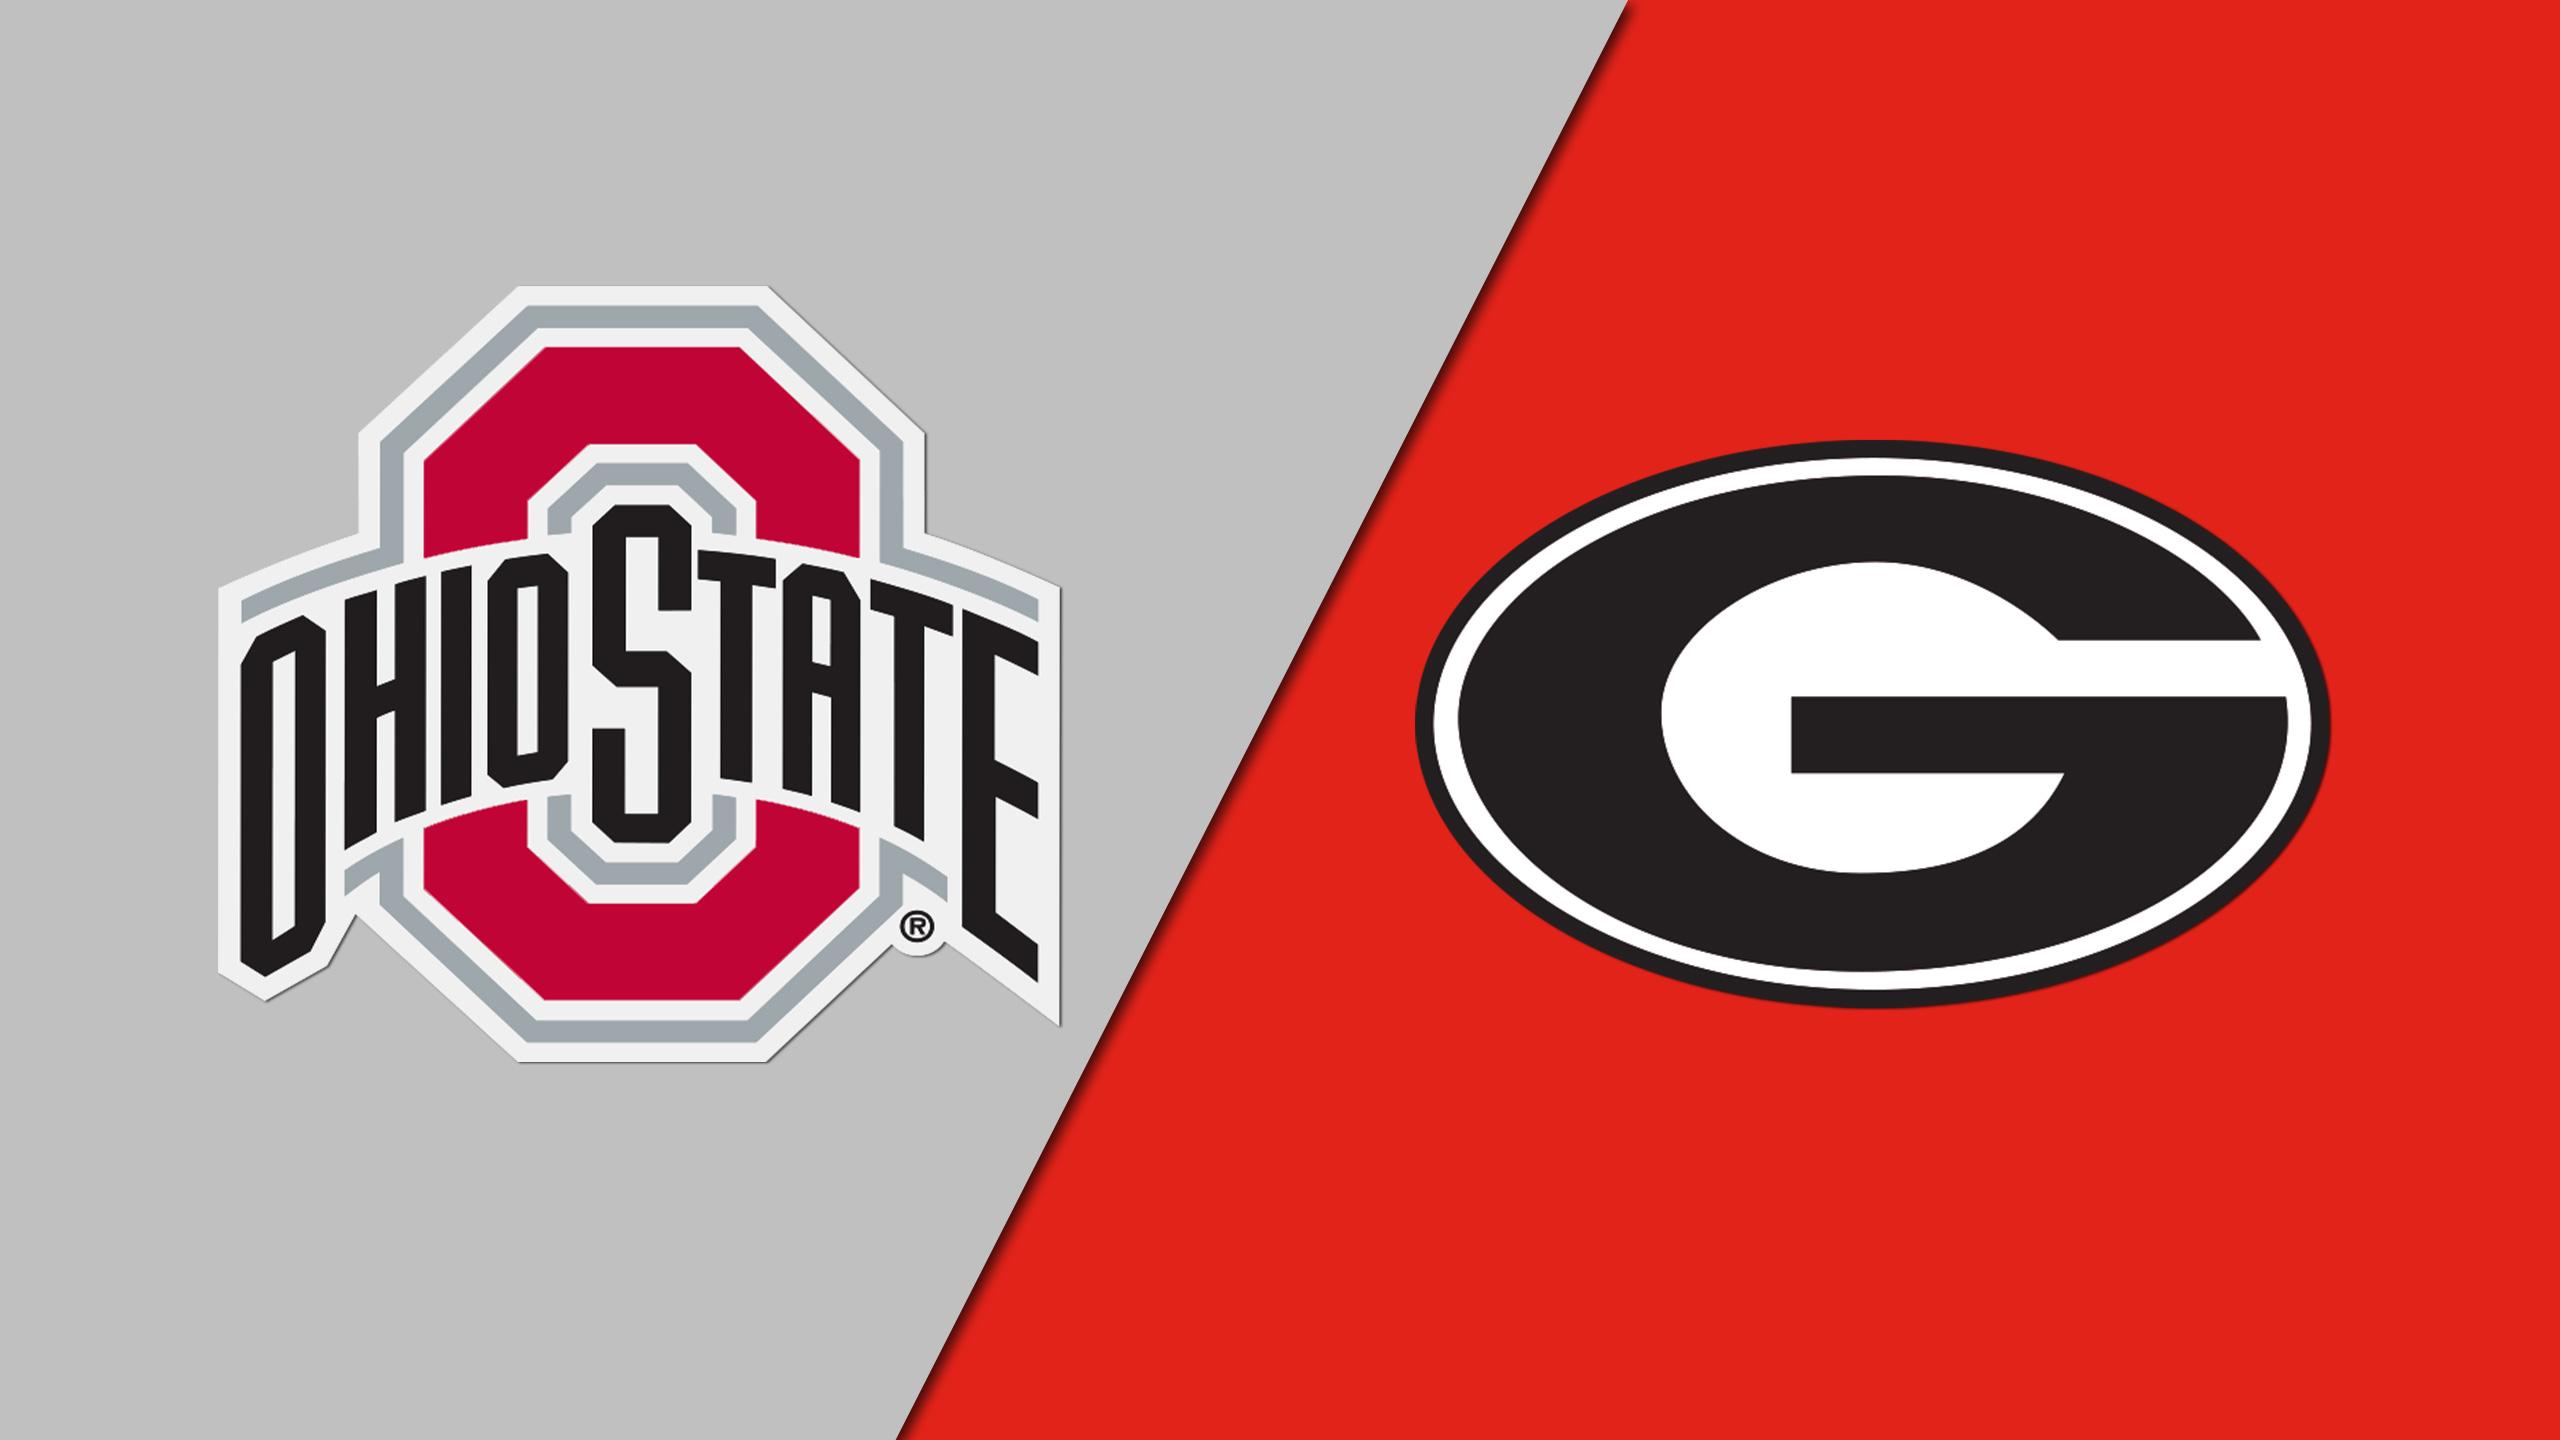 Ohio State vs. Georgia (W Gmynastics)